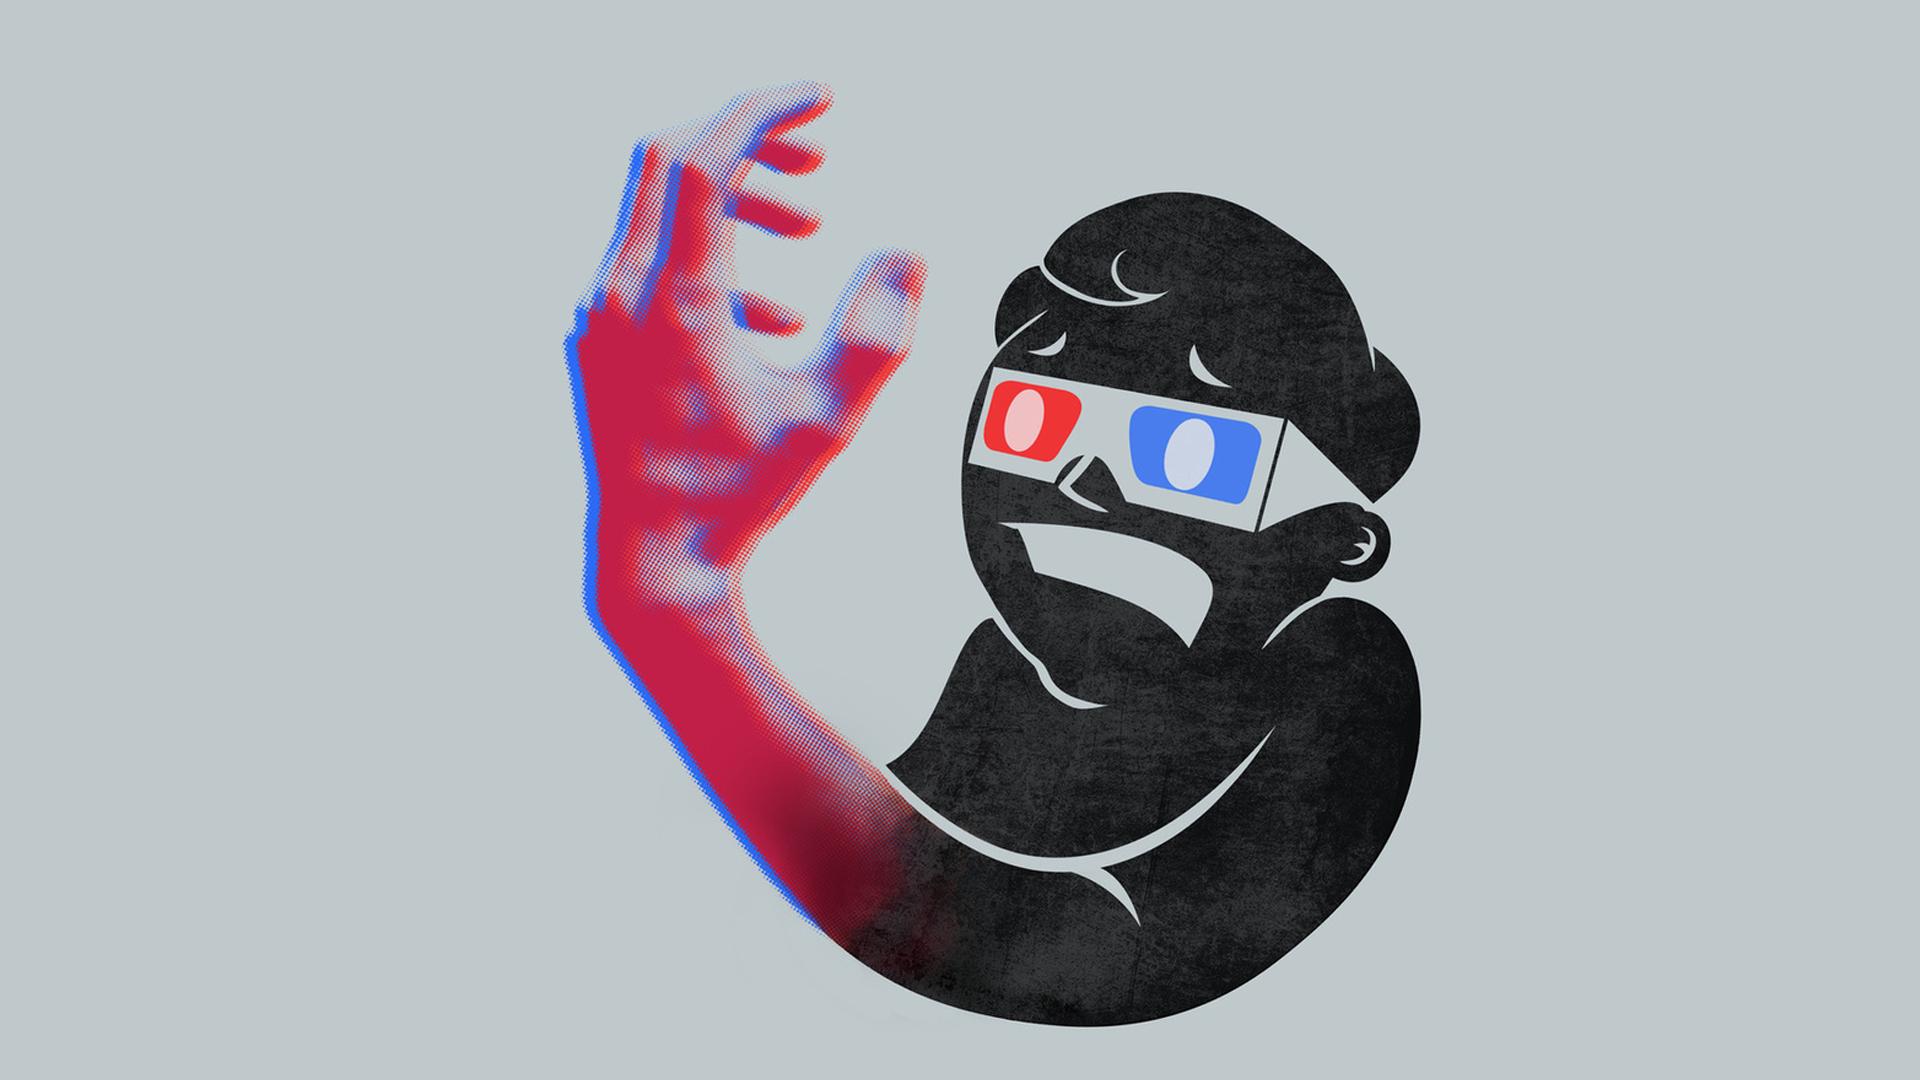 3D Pip Boy Anaglyph Fallout Minimalism